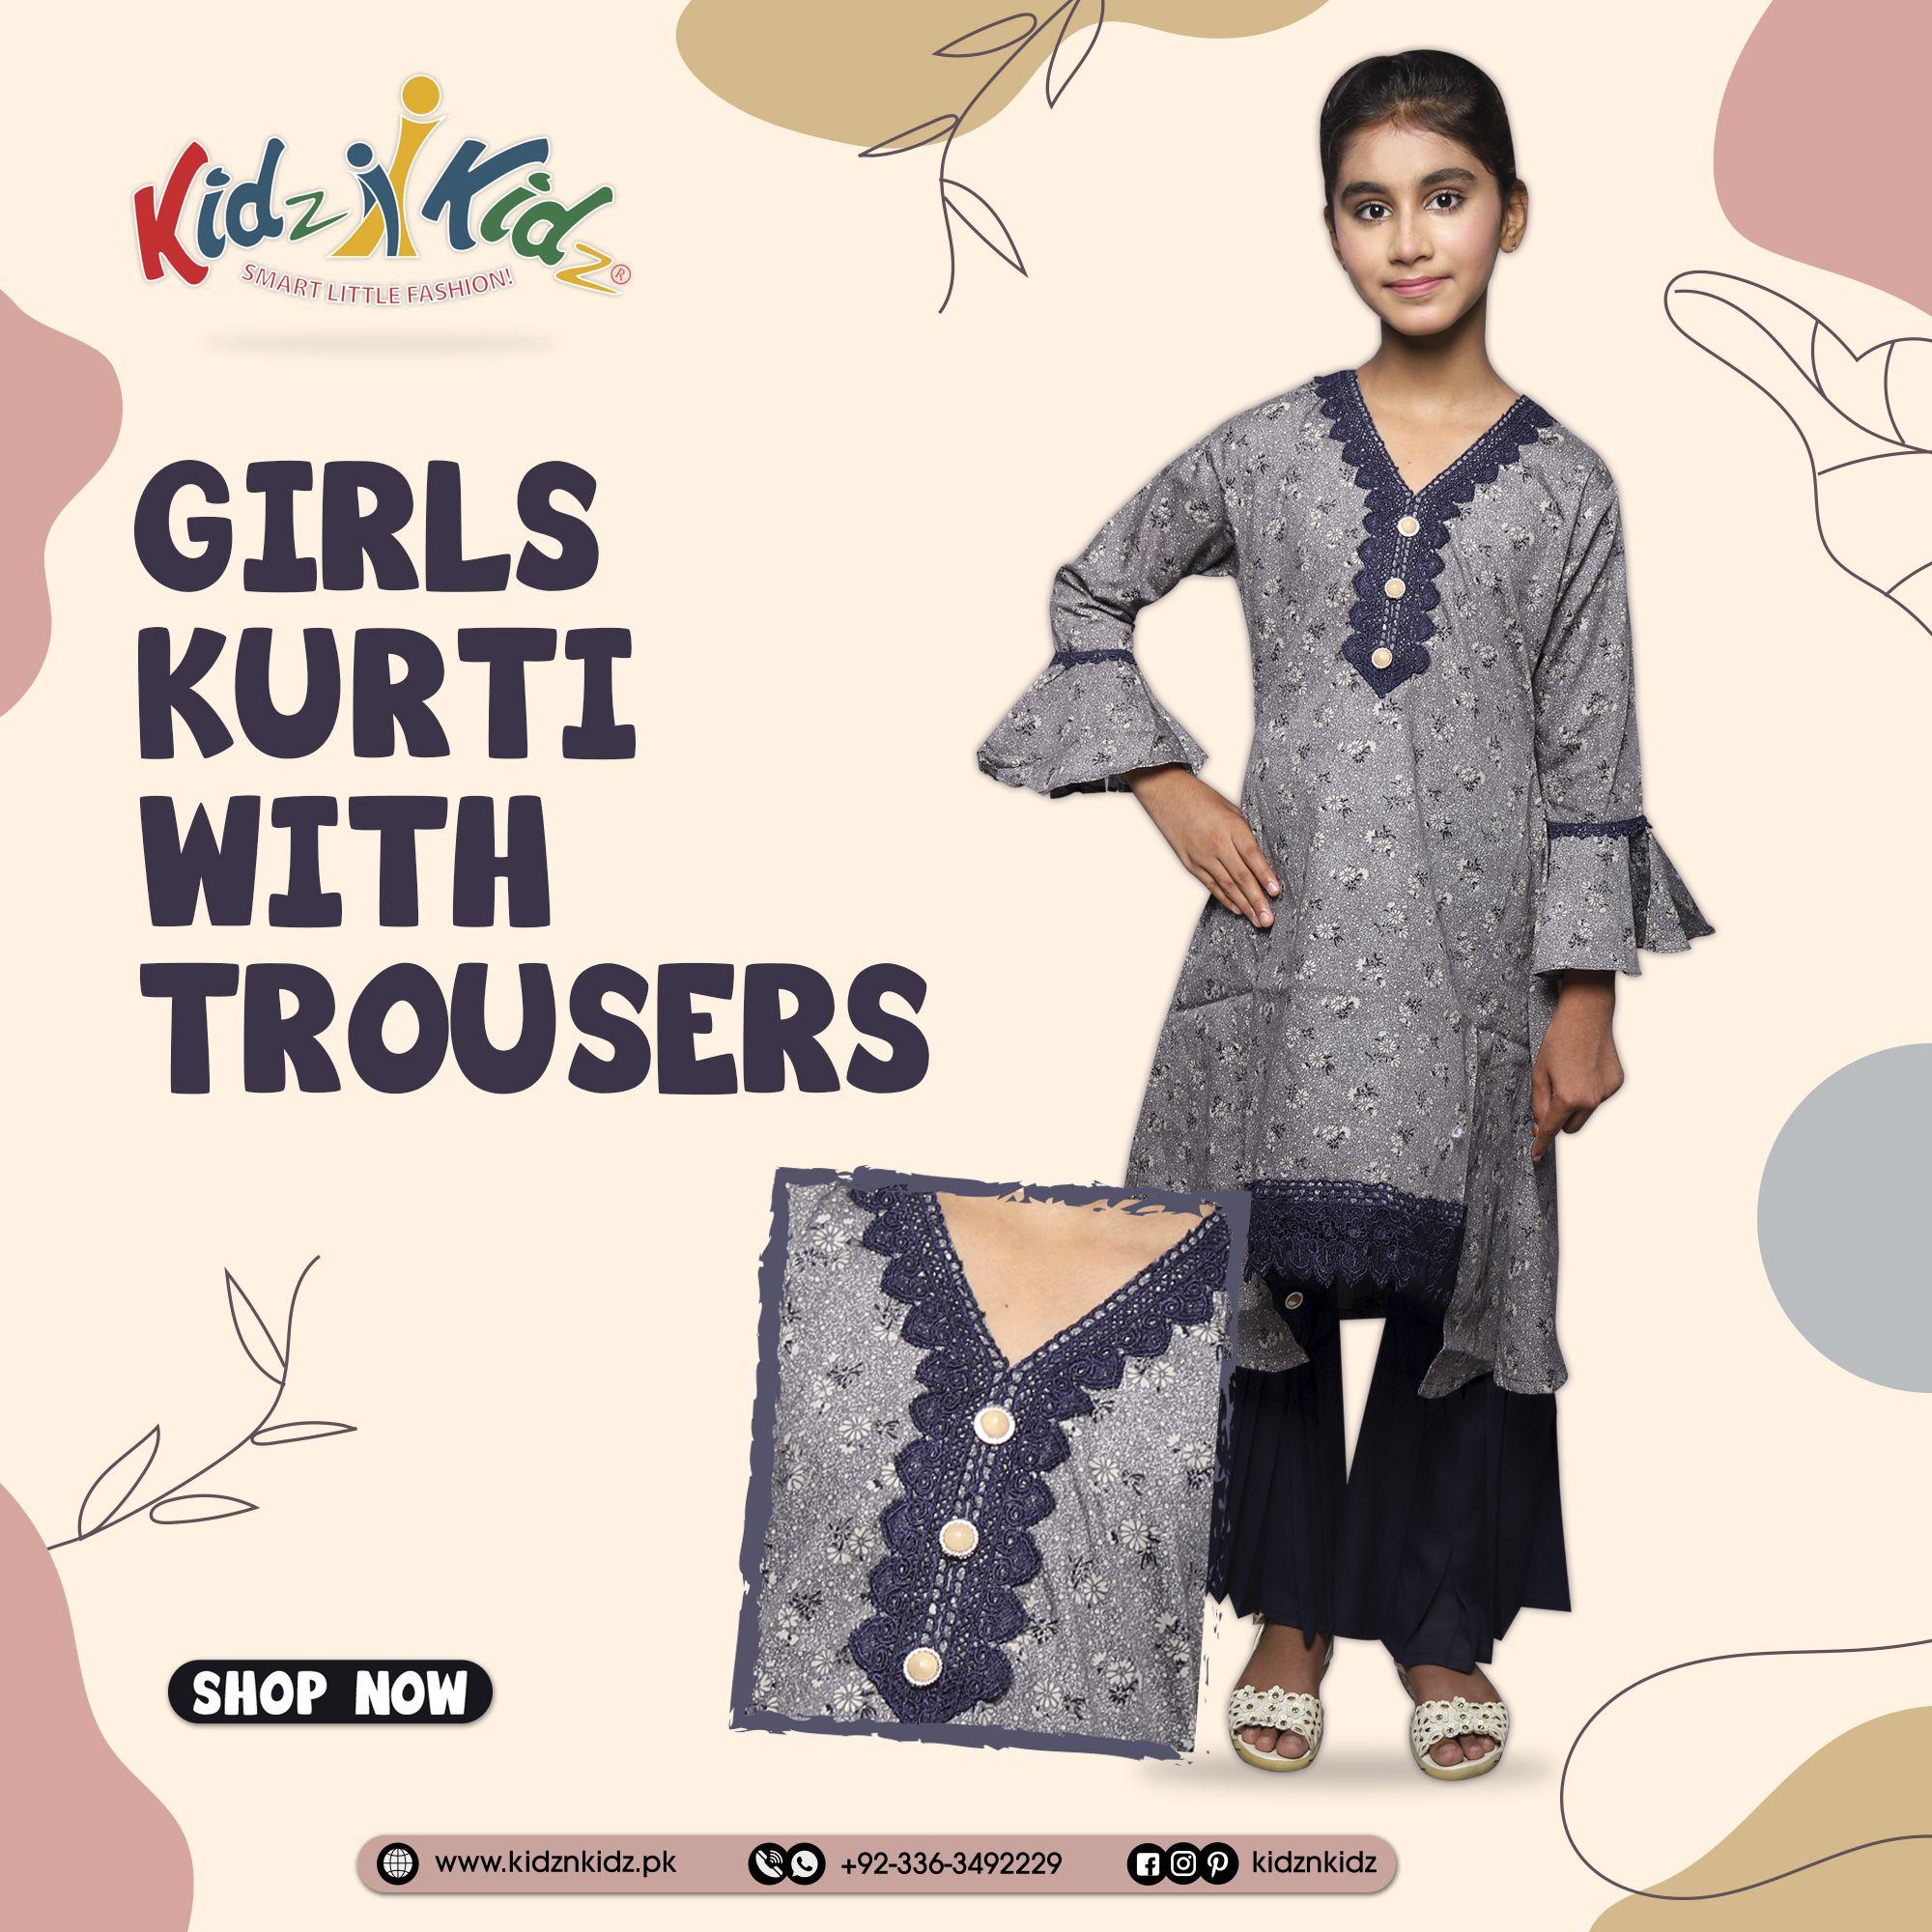 #girlskurti #trousers #girls #kurti #clothingbrand #kids #baby #kidsfahions #onlineshop #shopping #onlinestore #shoppingonline #onlineshopping